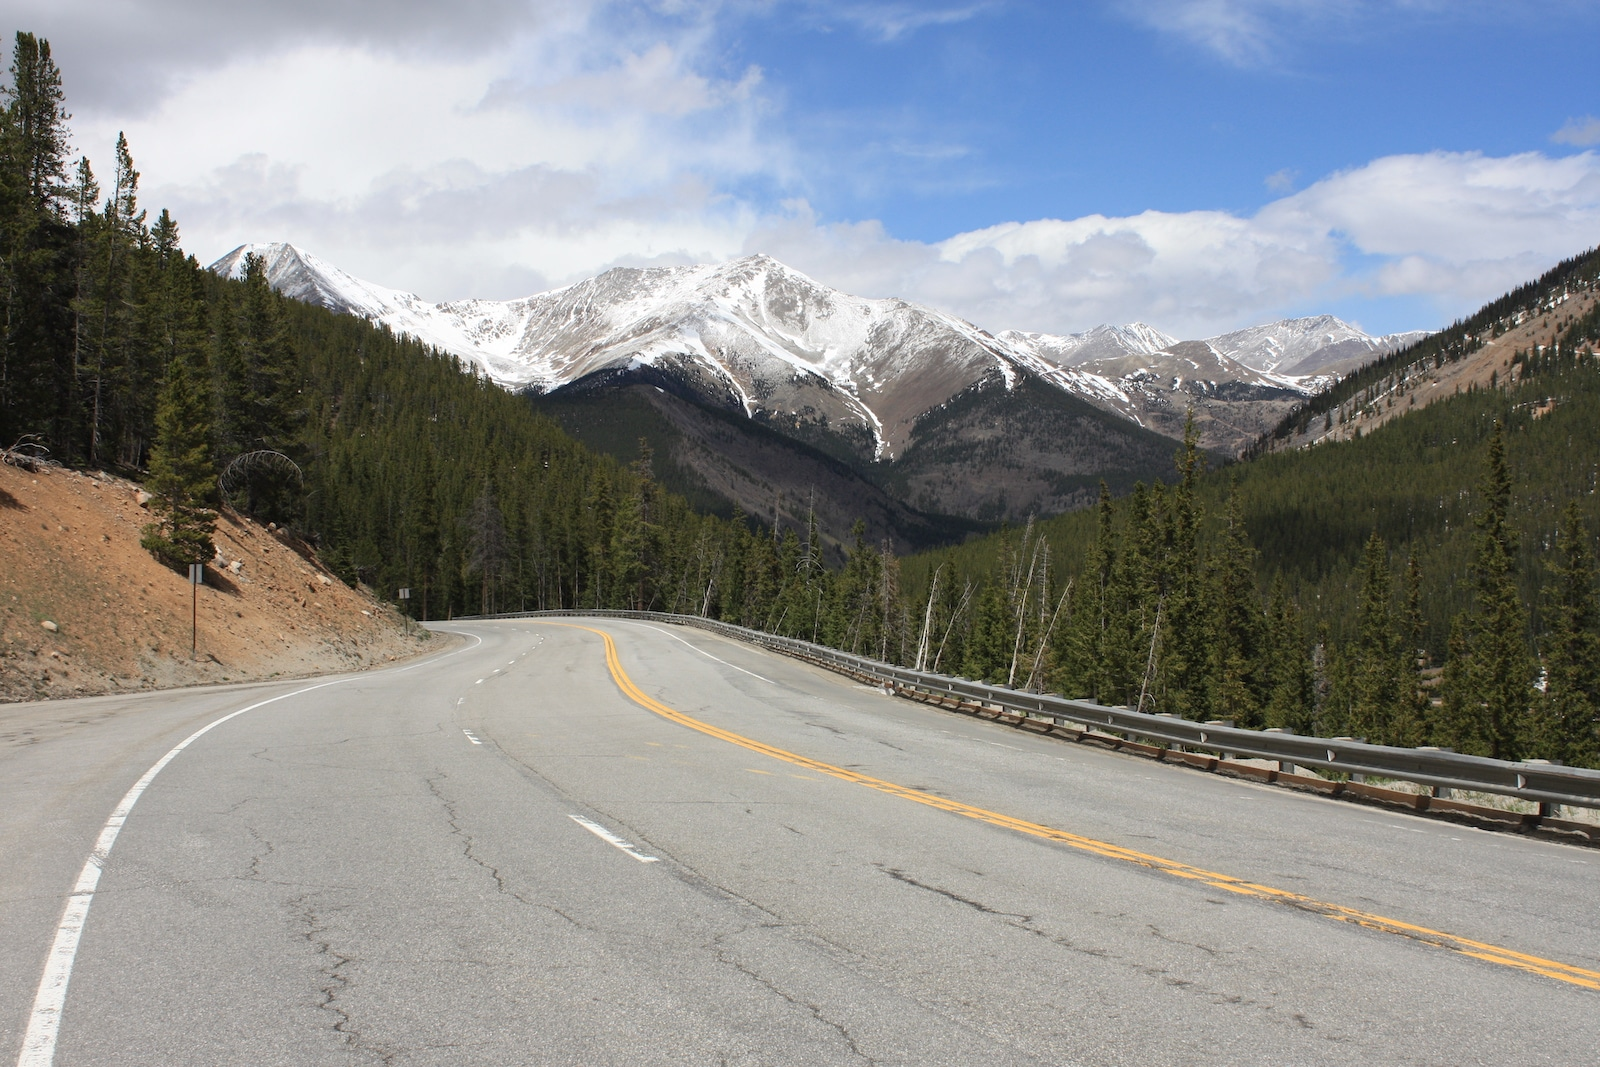 Mount Shavano and Tabeguache Peak Colorado